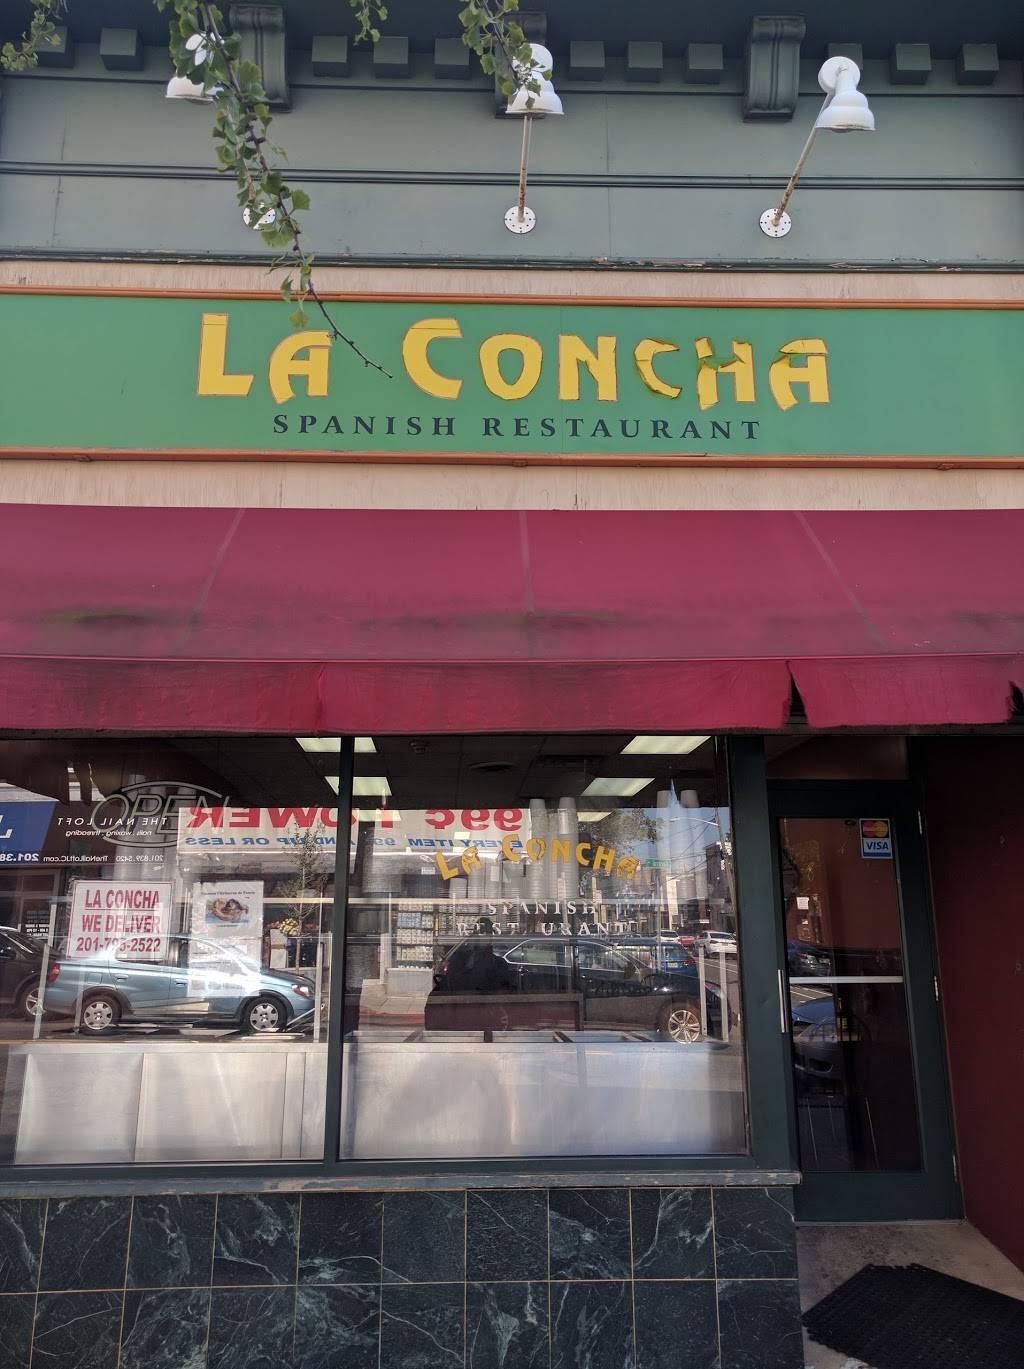 La Concha   restaurant   384 Central Ave, Jersey City, NJ 07307, USA   2017952522 OR +1 201-795-2522